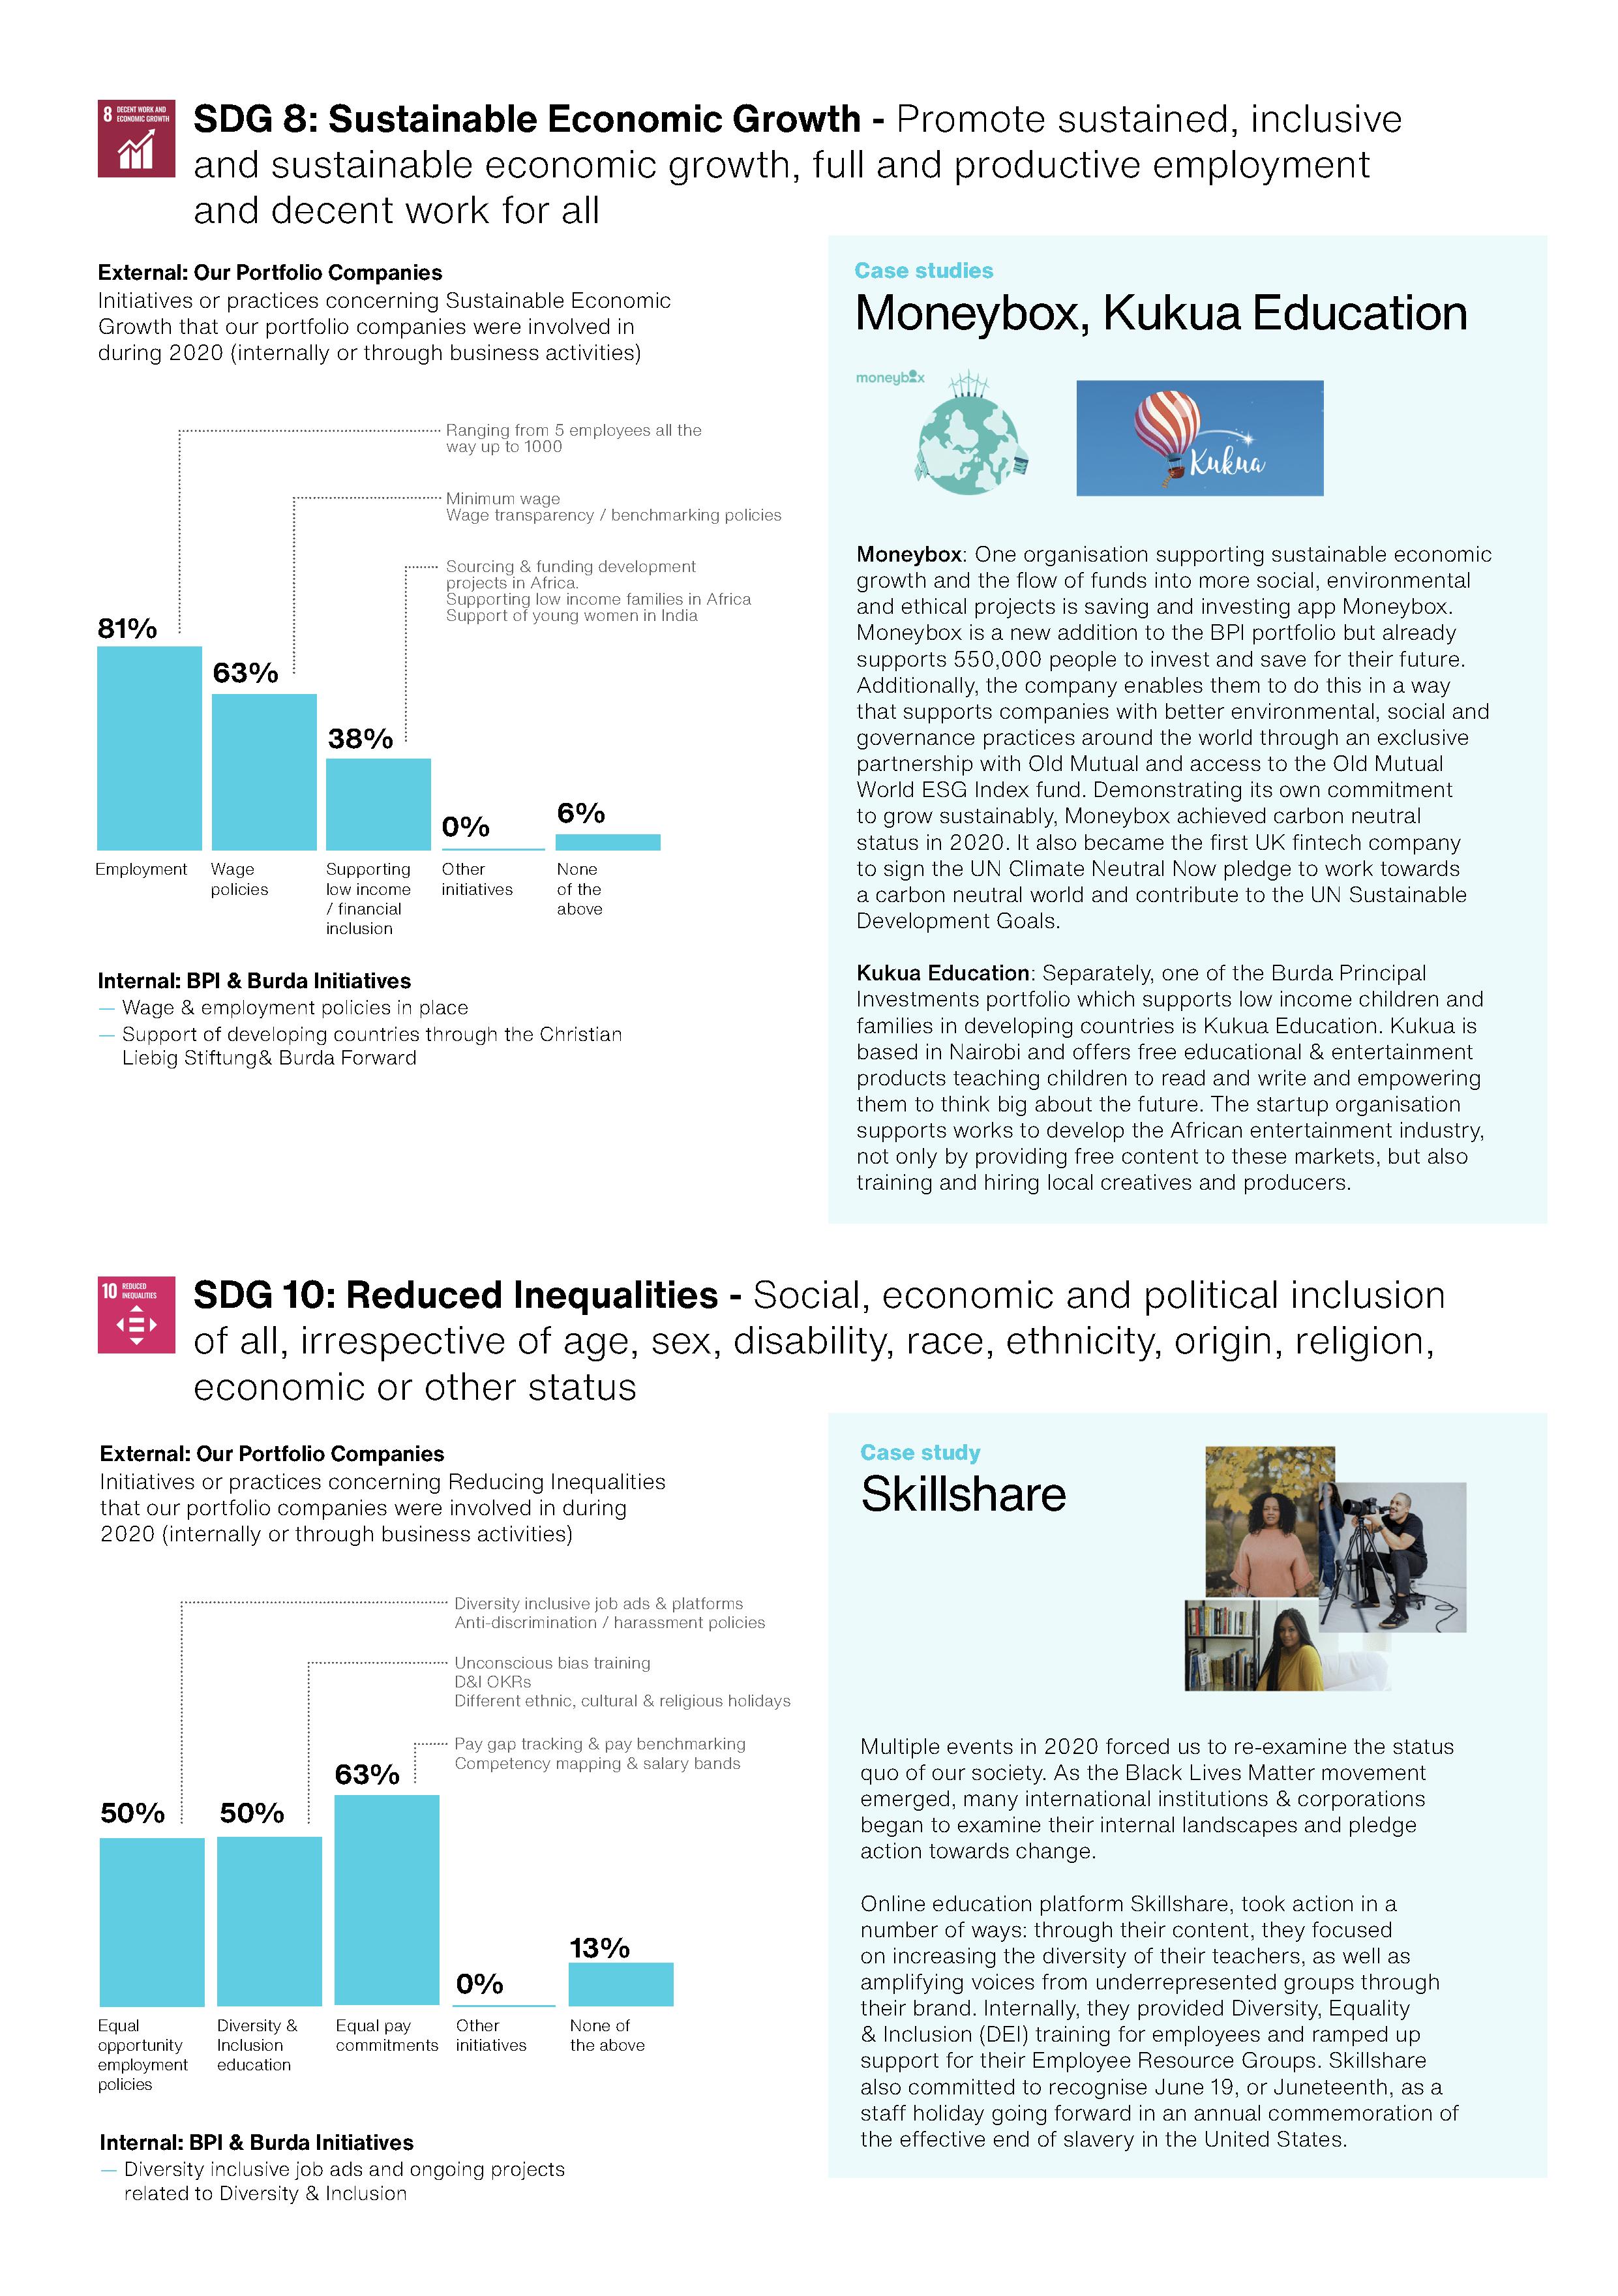 Burda Principal Investment - Impact & ESG Review